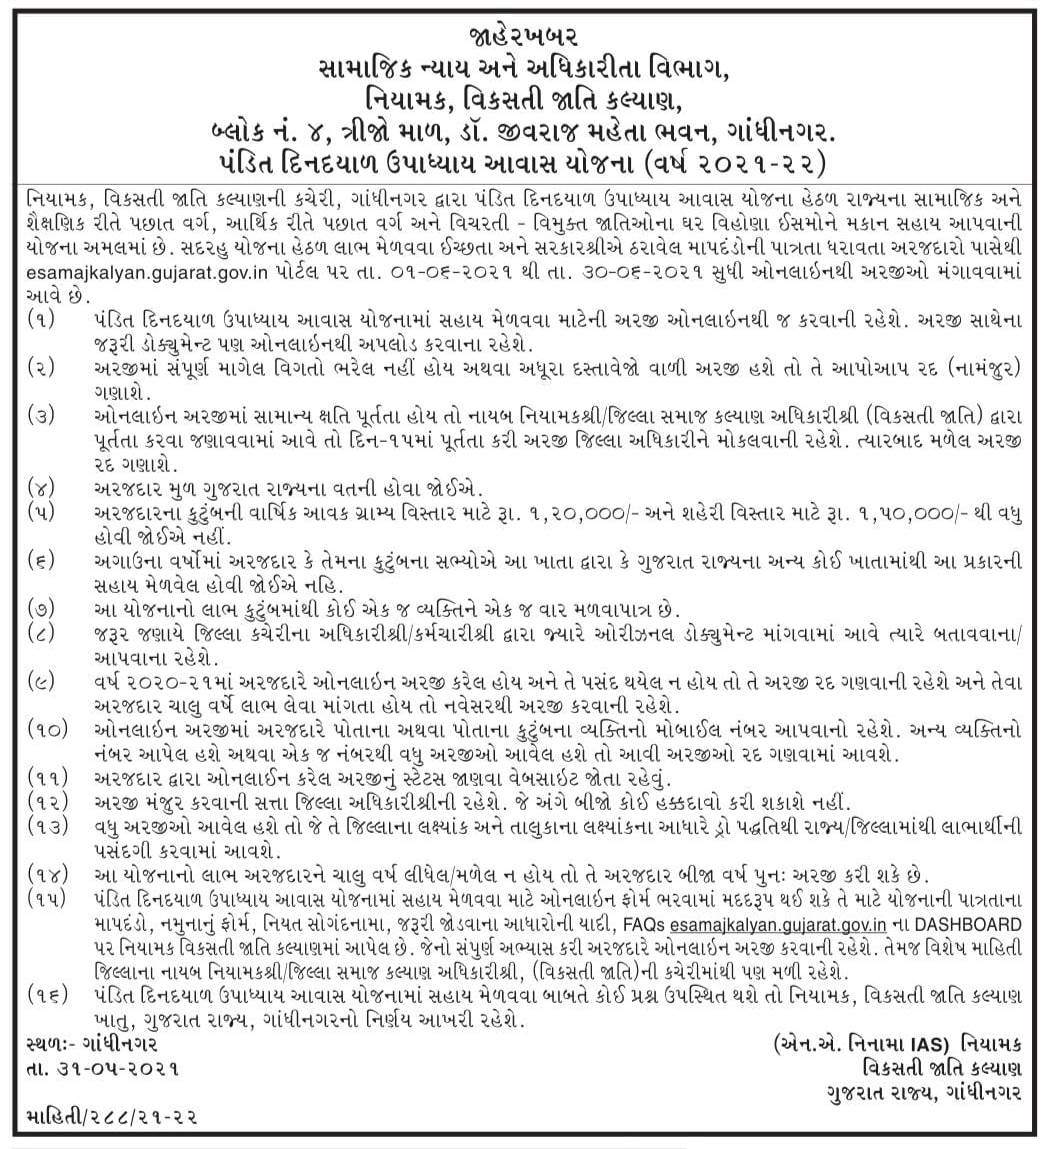 Gujarat Makan Sahay Yojana: Pandit Din Dayal Upadhyay Awas Yojana 2021-22